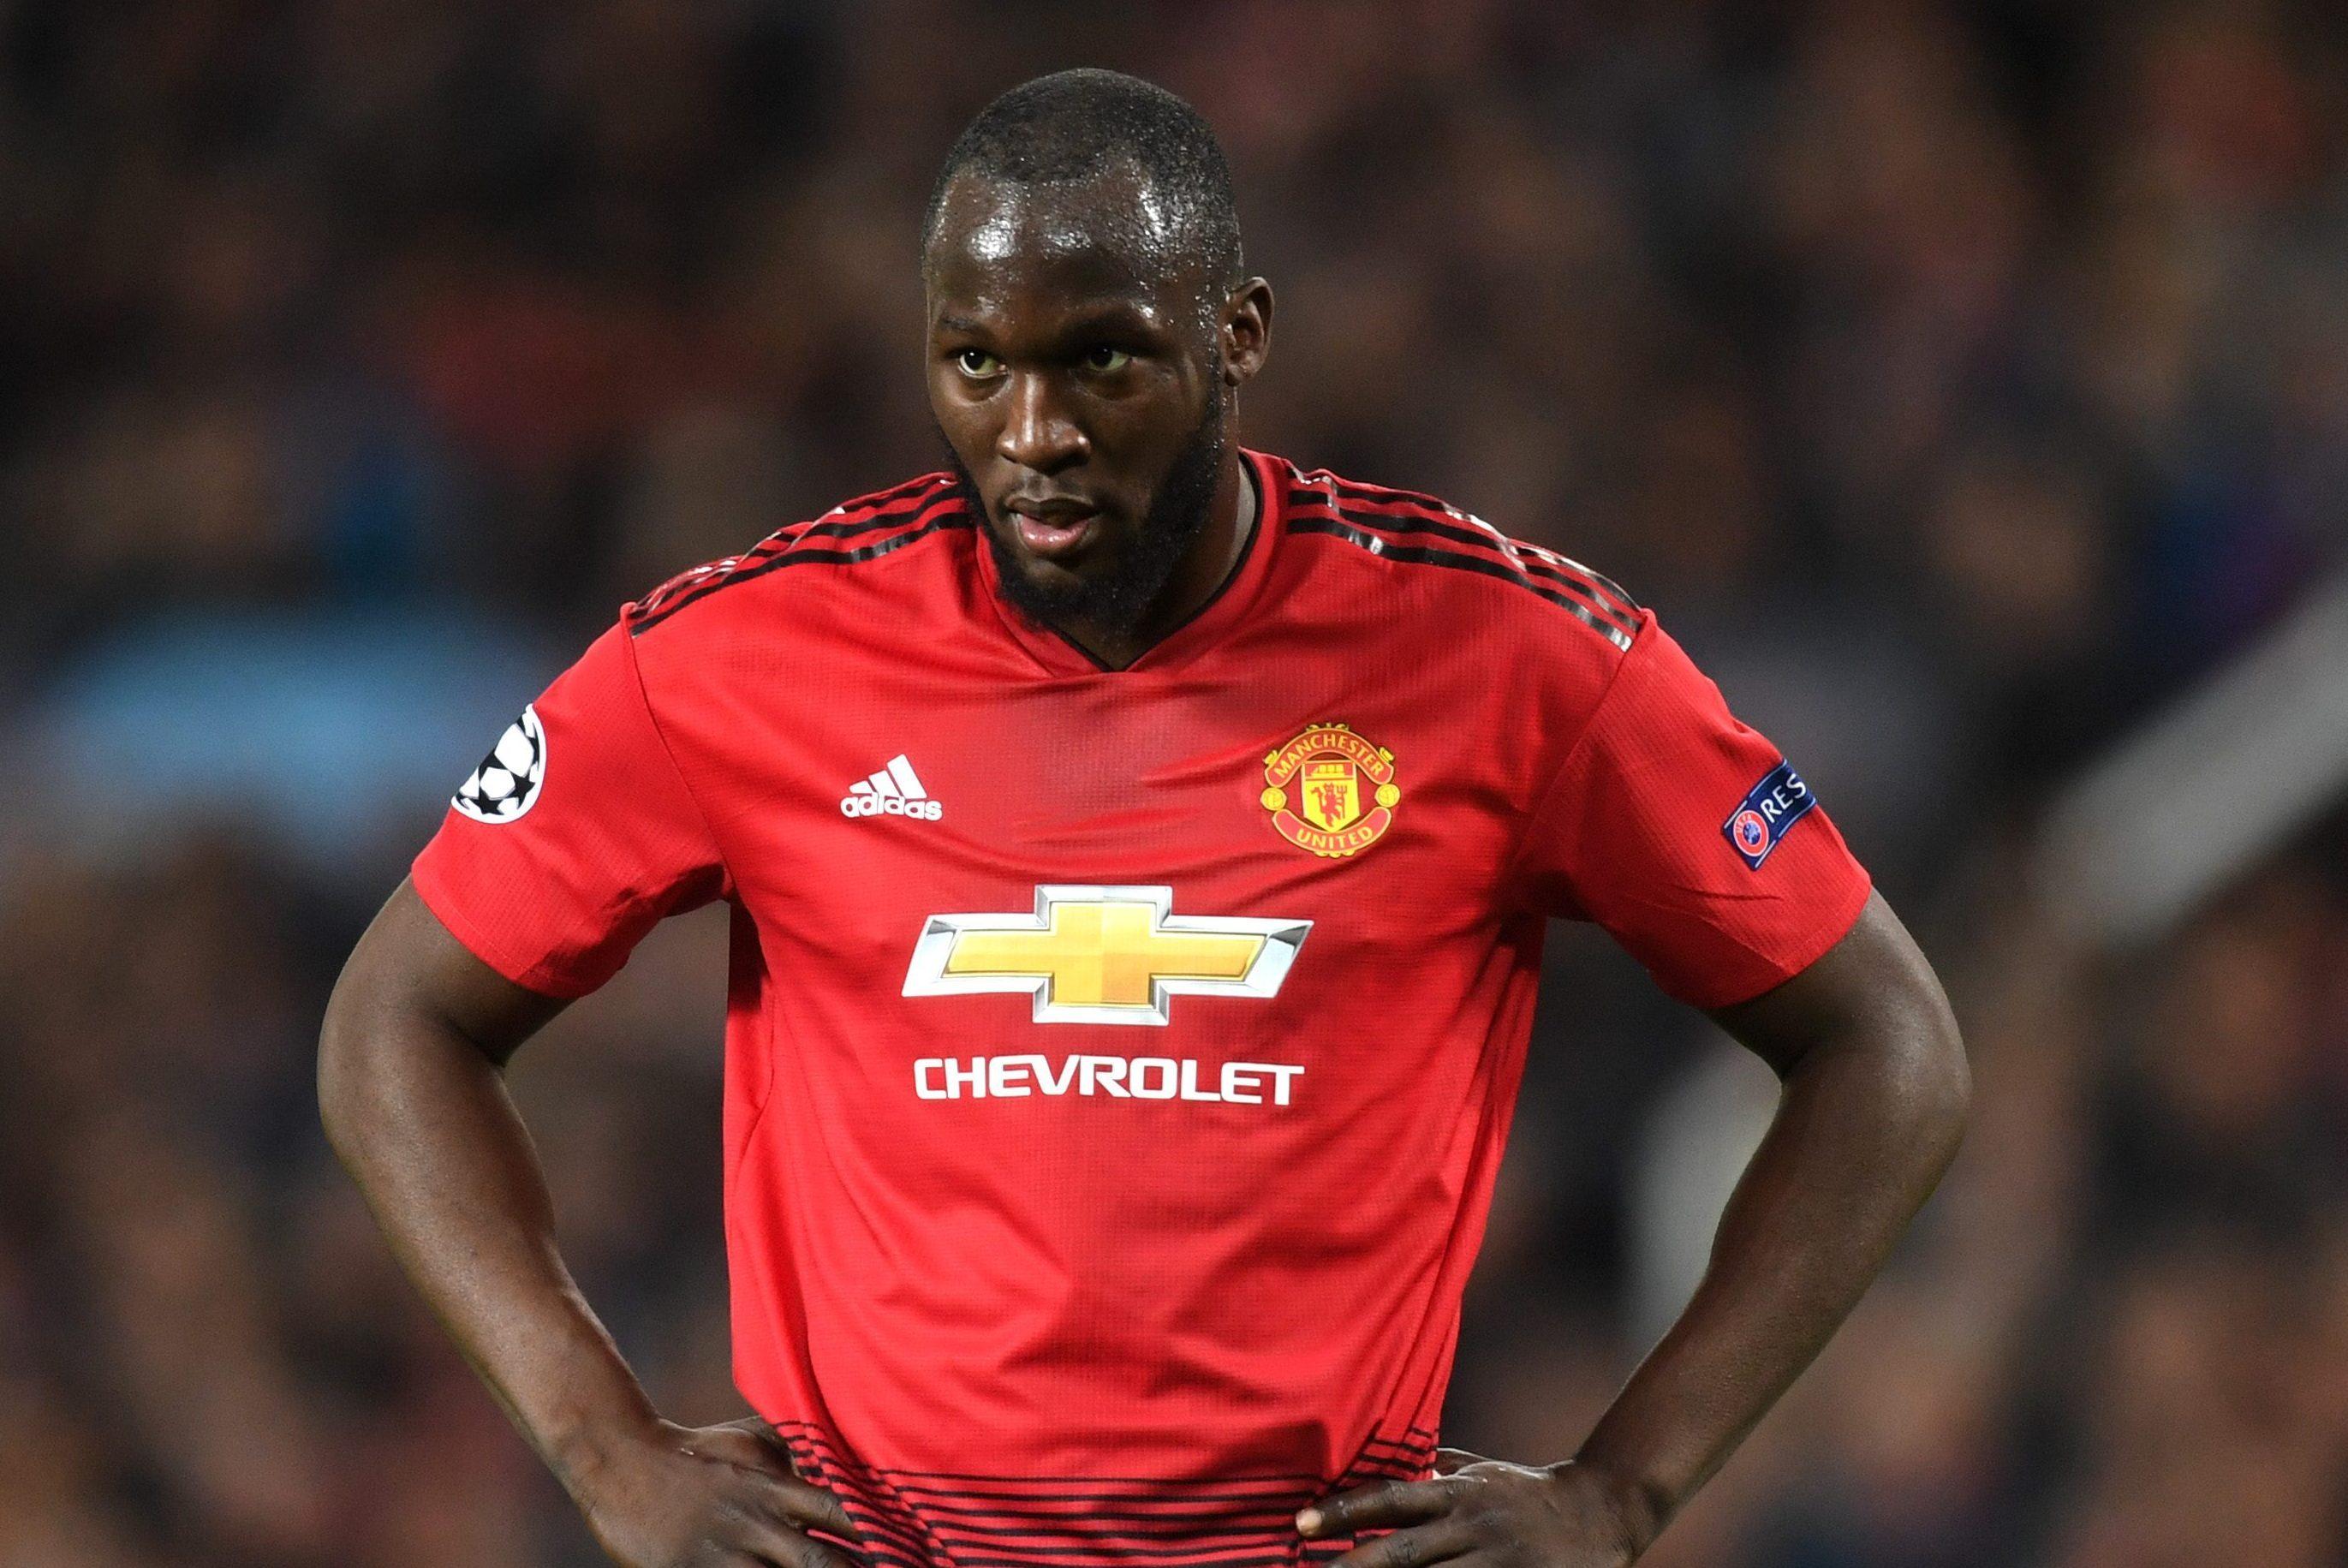 Romelu Lukaku, attaccante del Manchester United